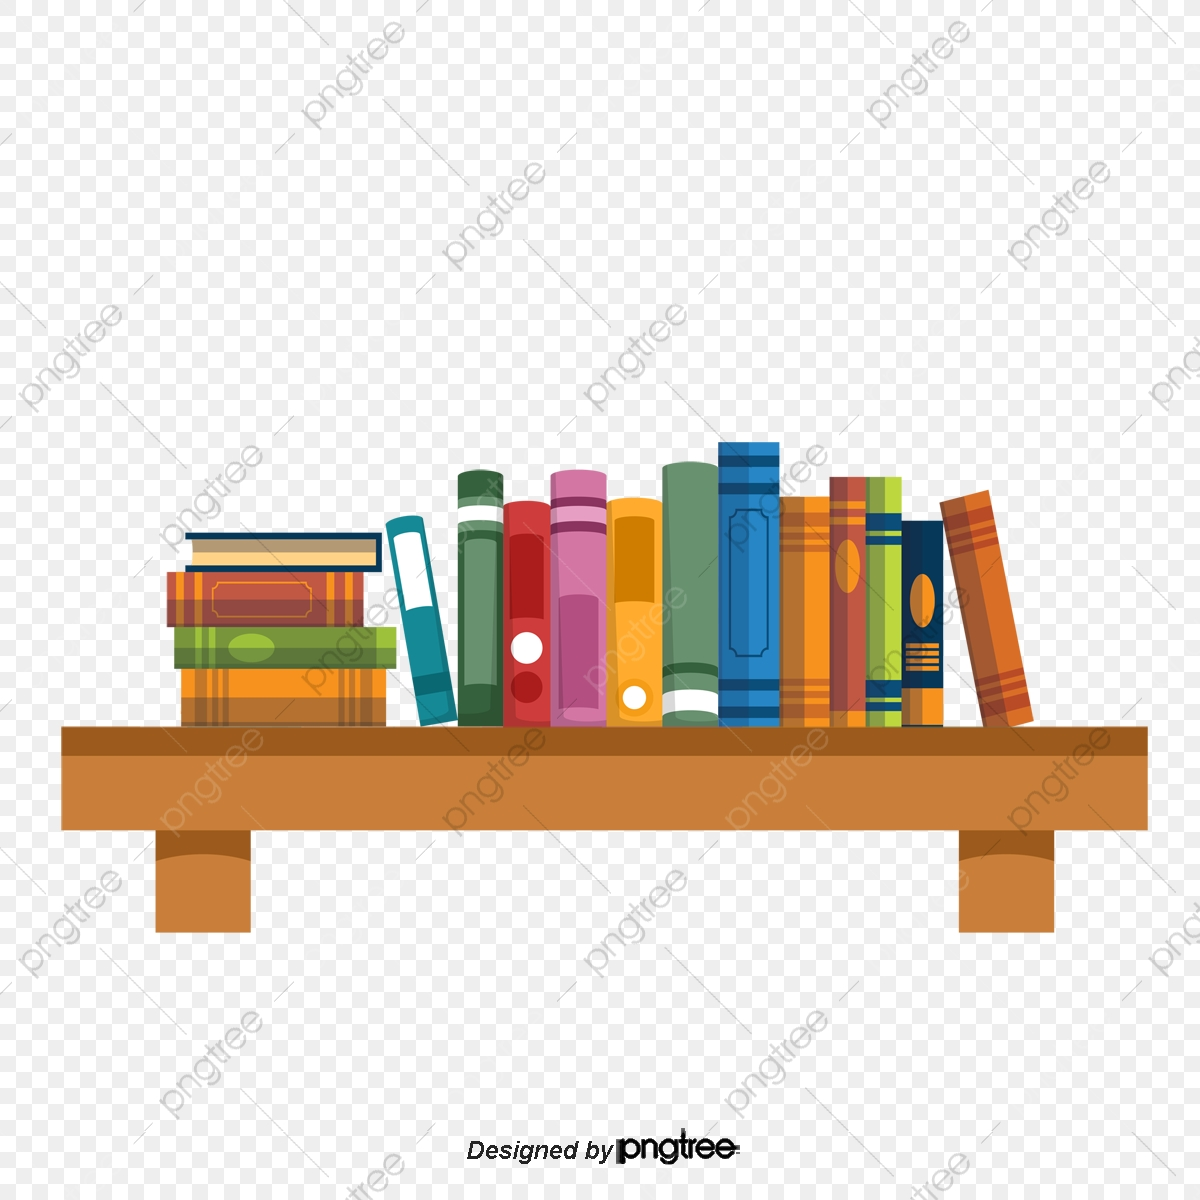 vector transparent download Bookshelf vector book shelf. Put the shelves clipart